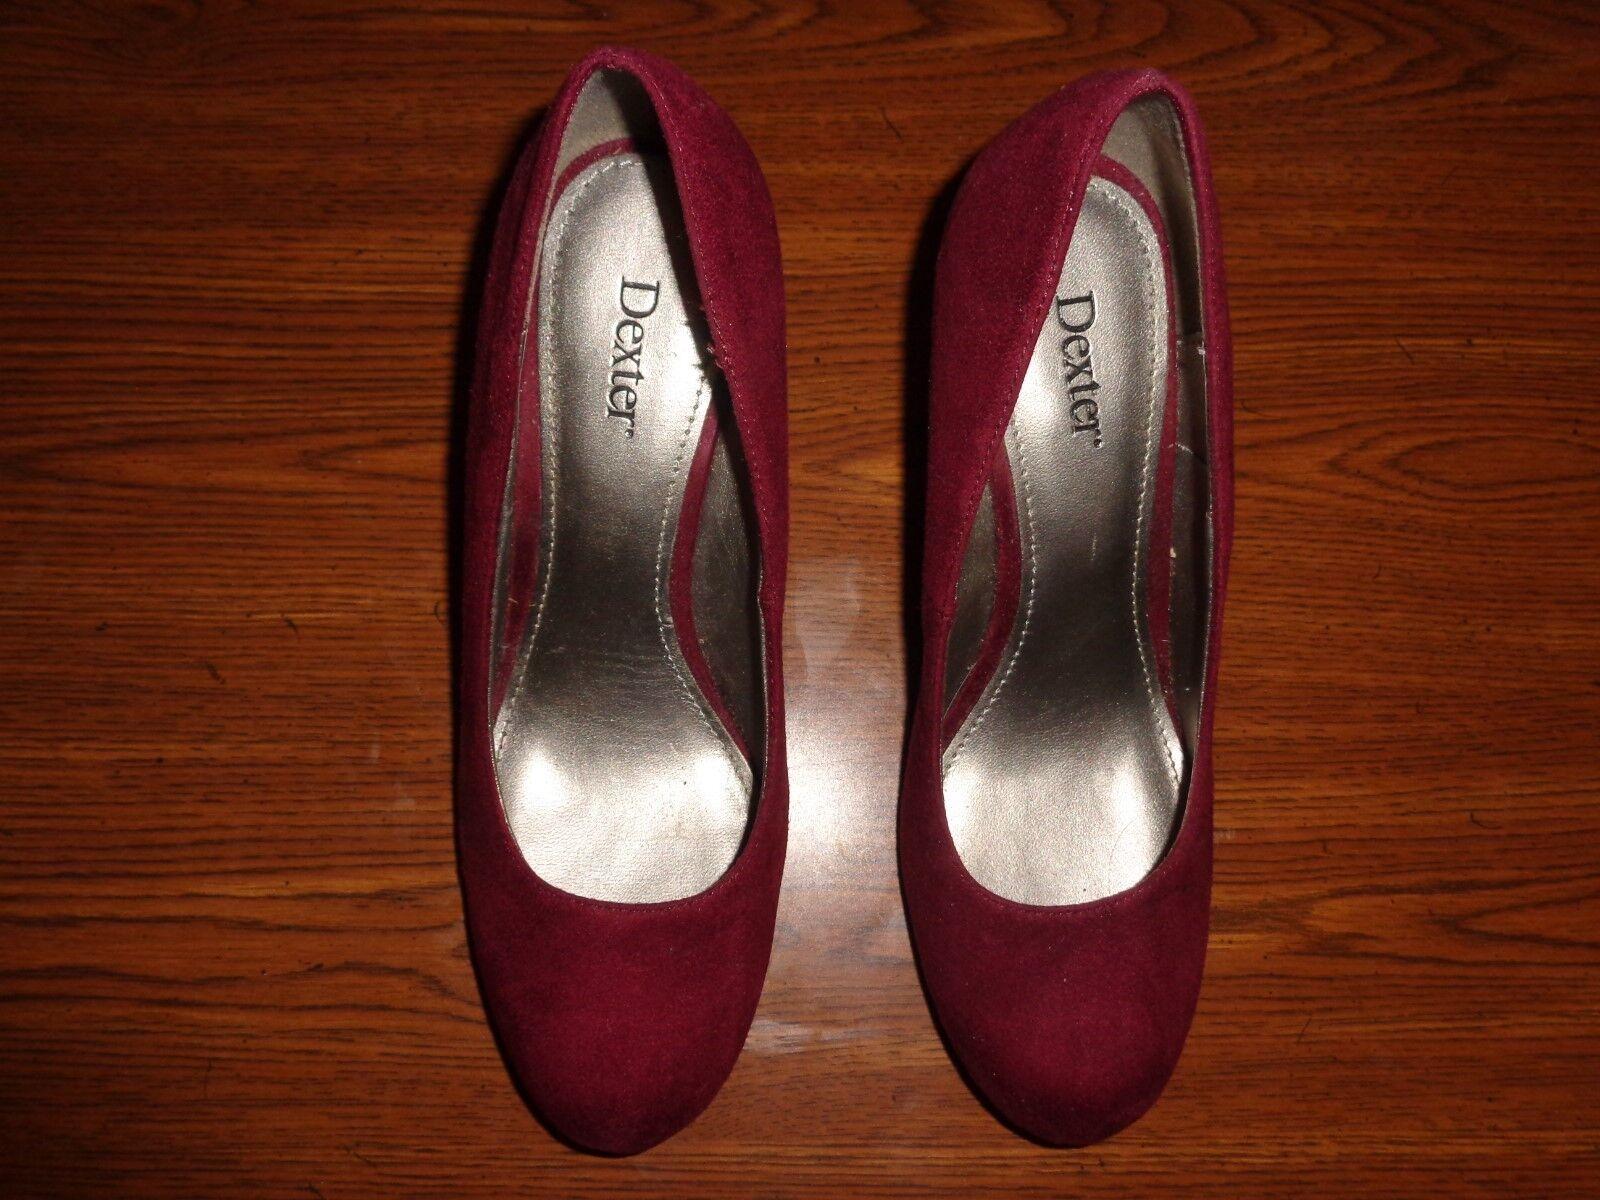 dexter 1 wedge 5 femme chaussures 3 chaussures dexter cm 2 taille tAnaq0wW